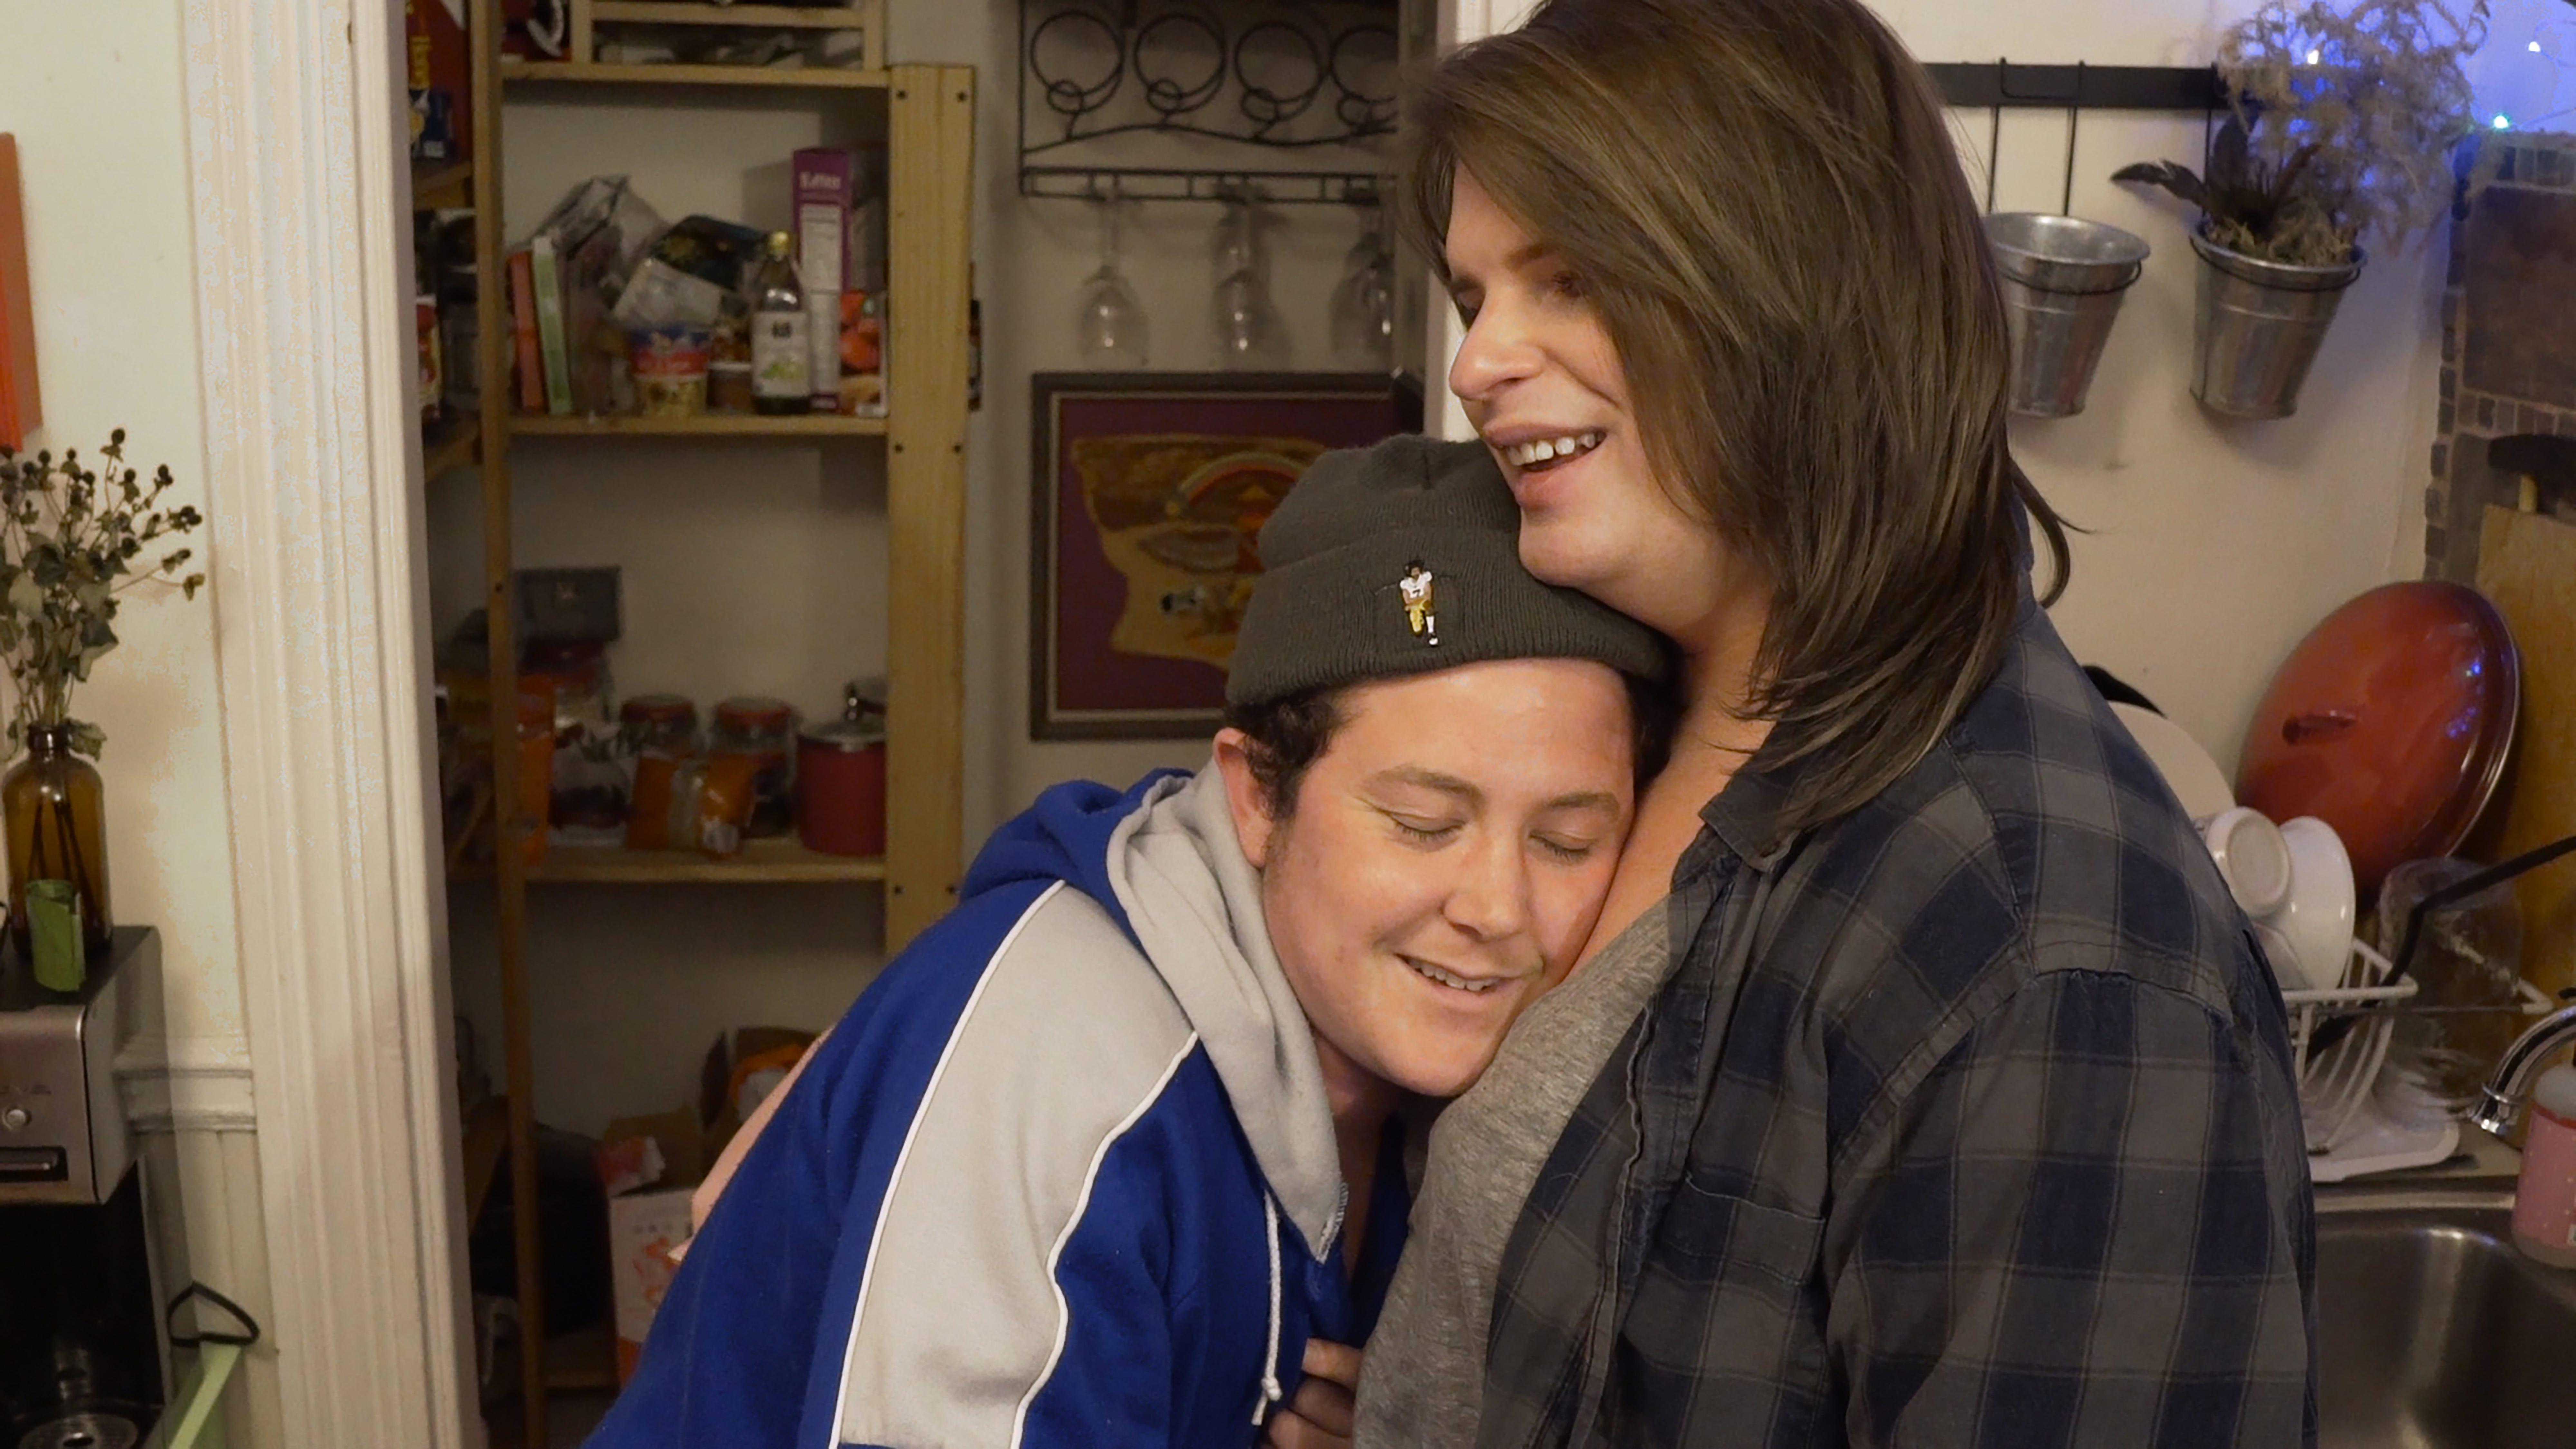 Friendship of transgender New Jersey natives celebrated in 'Jack & Yaya' documentary